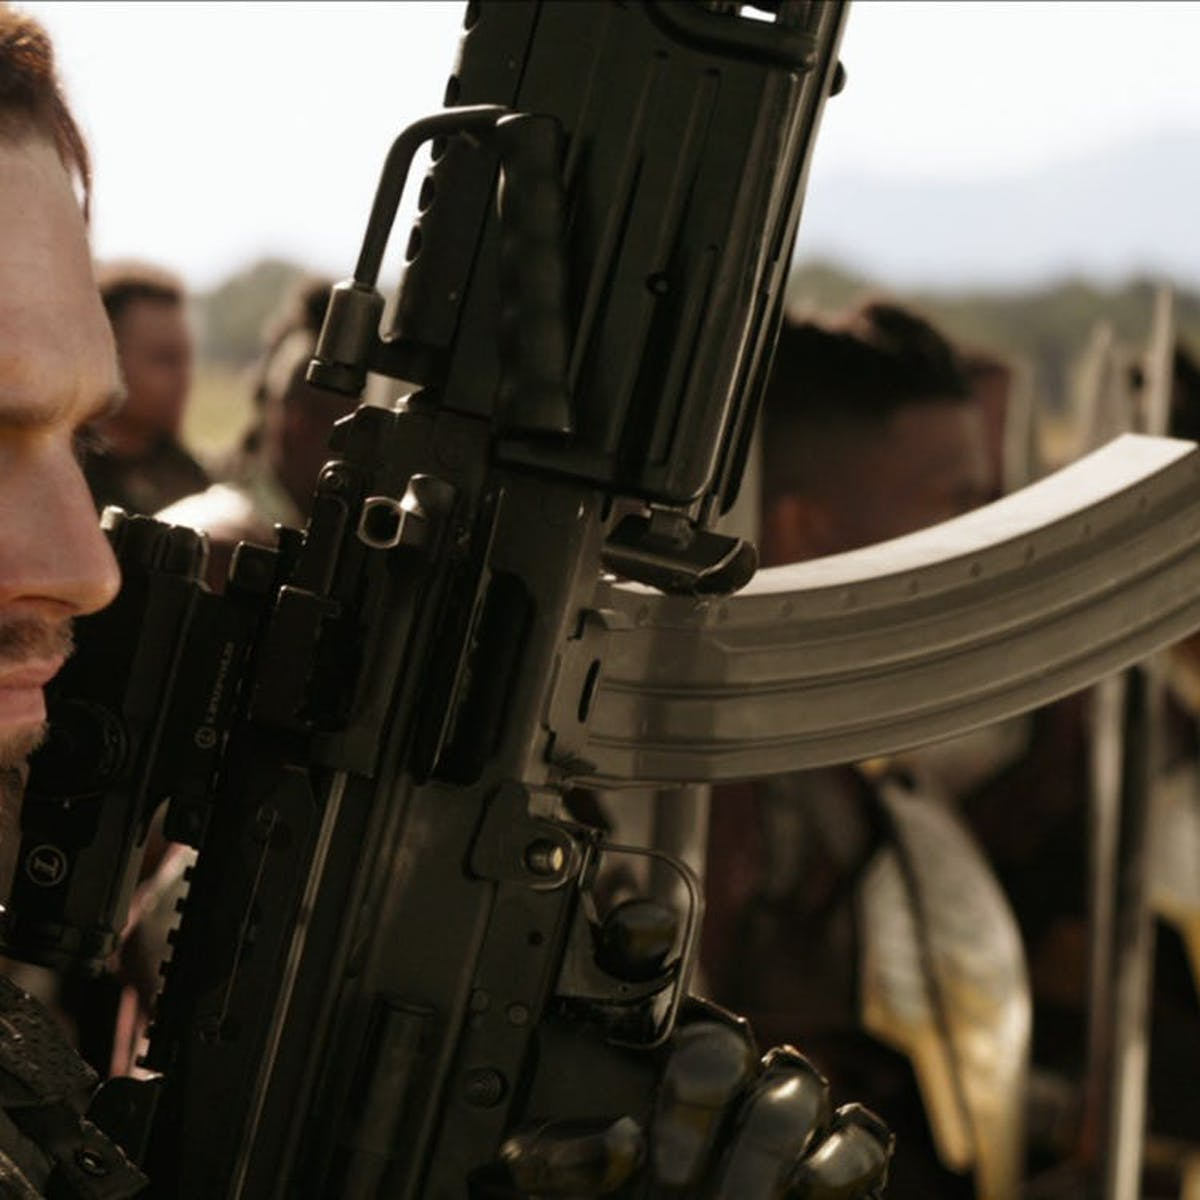 New 'Infinity War' Photo Puts Bucky's Badass Arm on Display